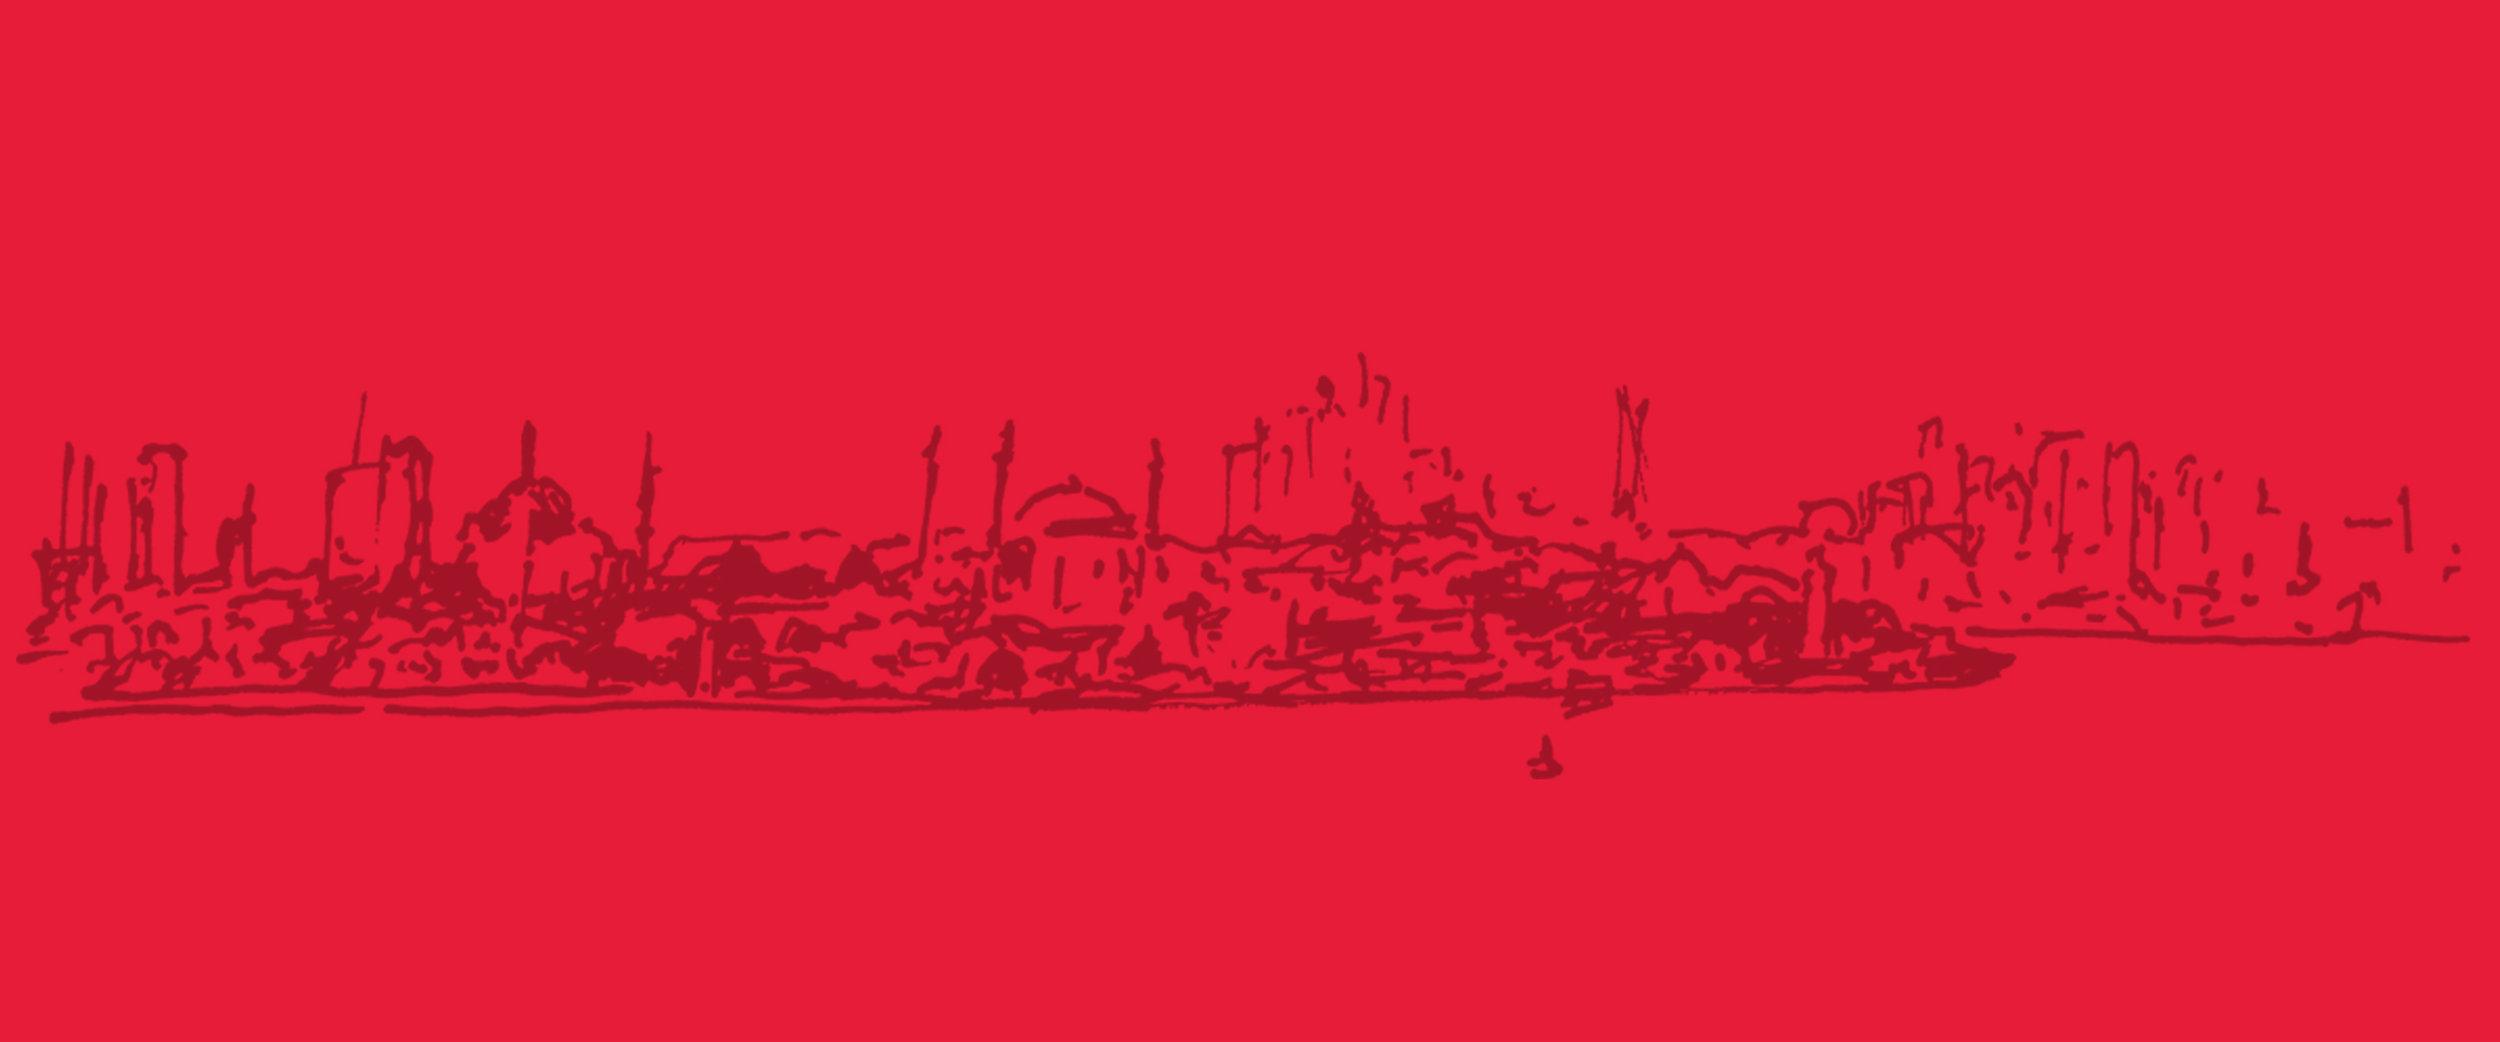 Turkiss-sketch.jpg